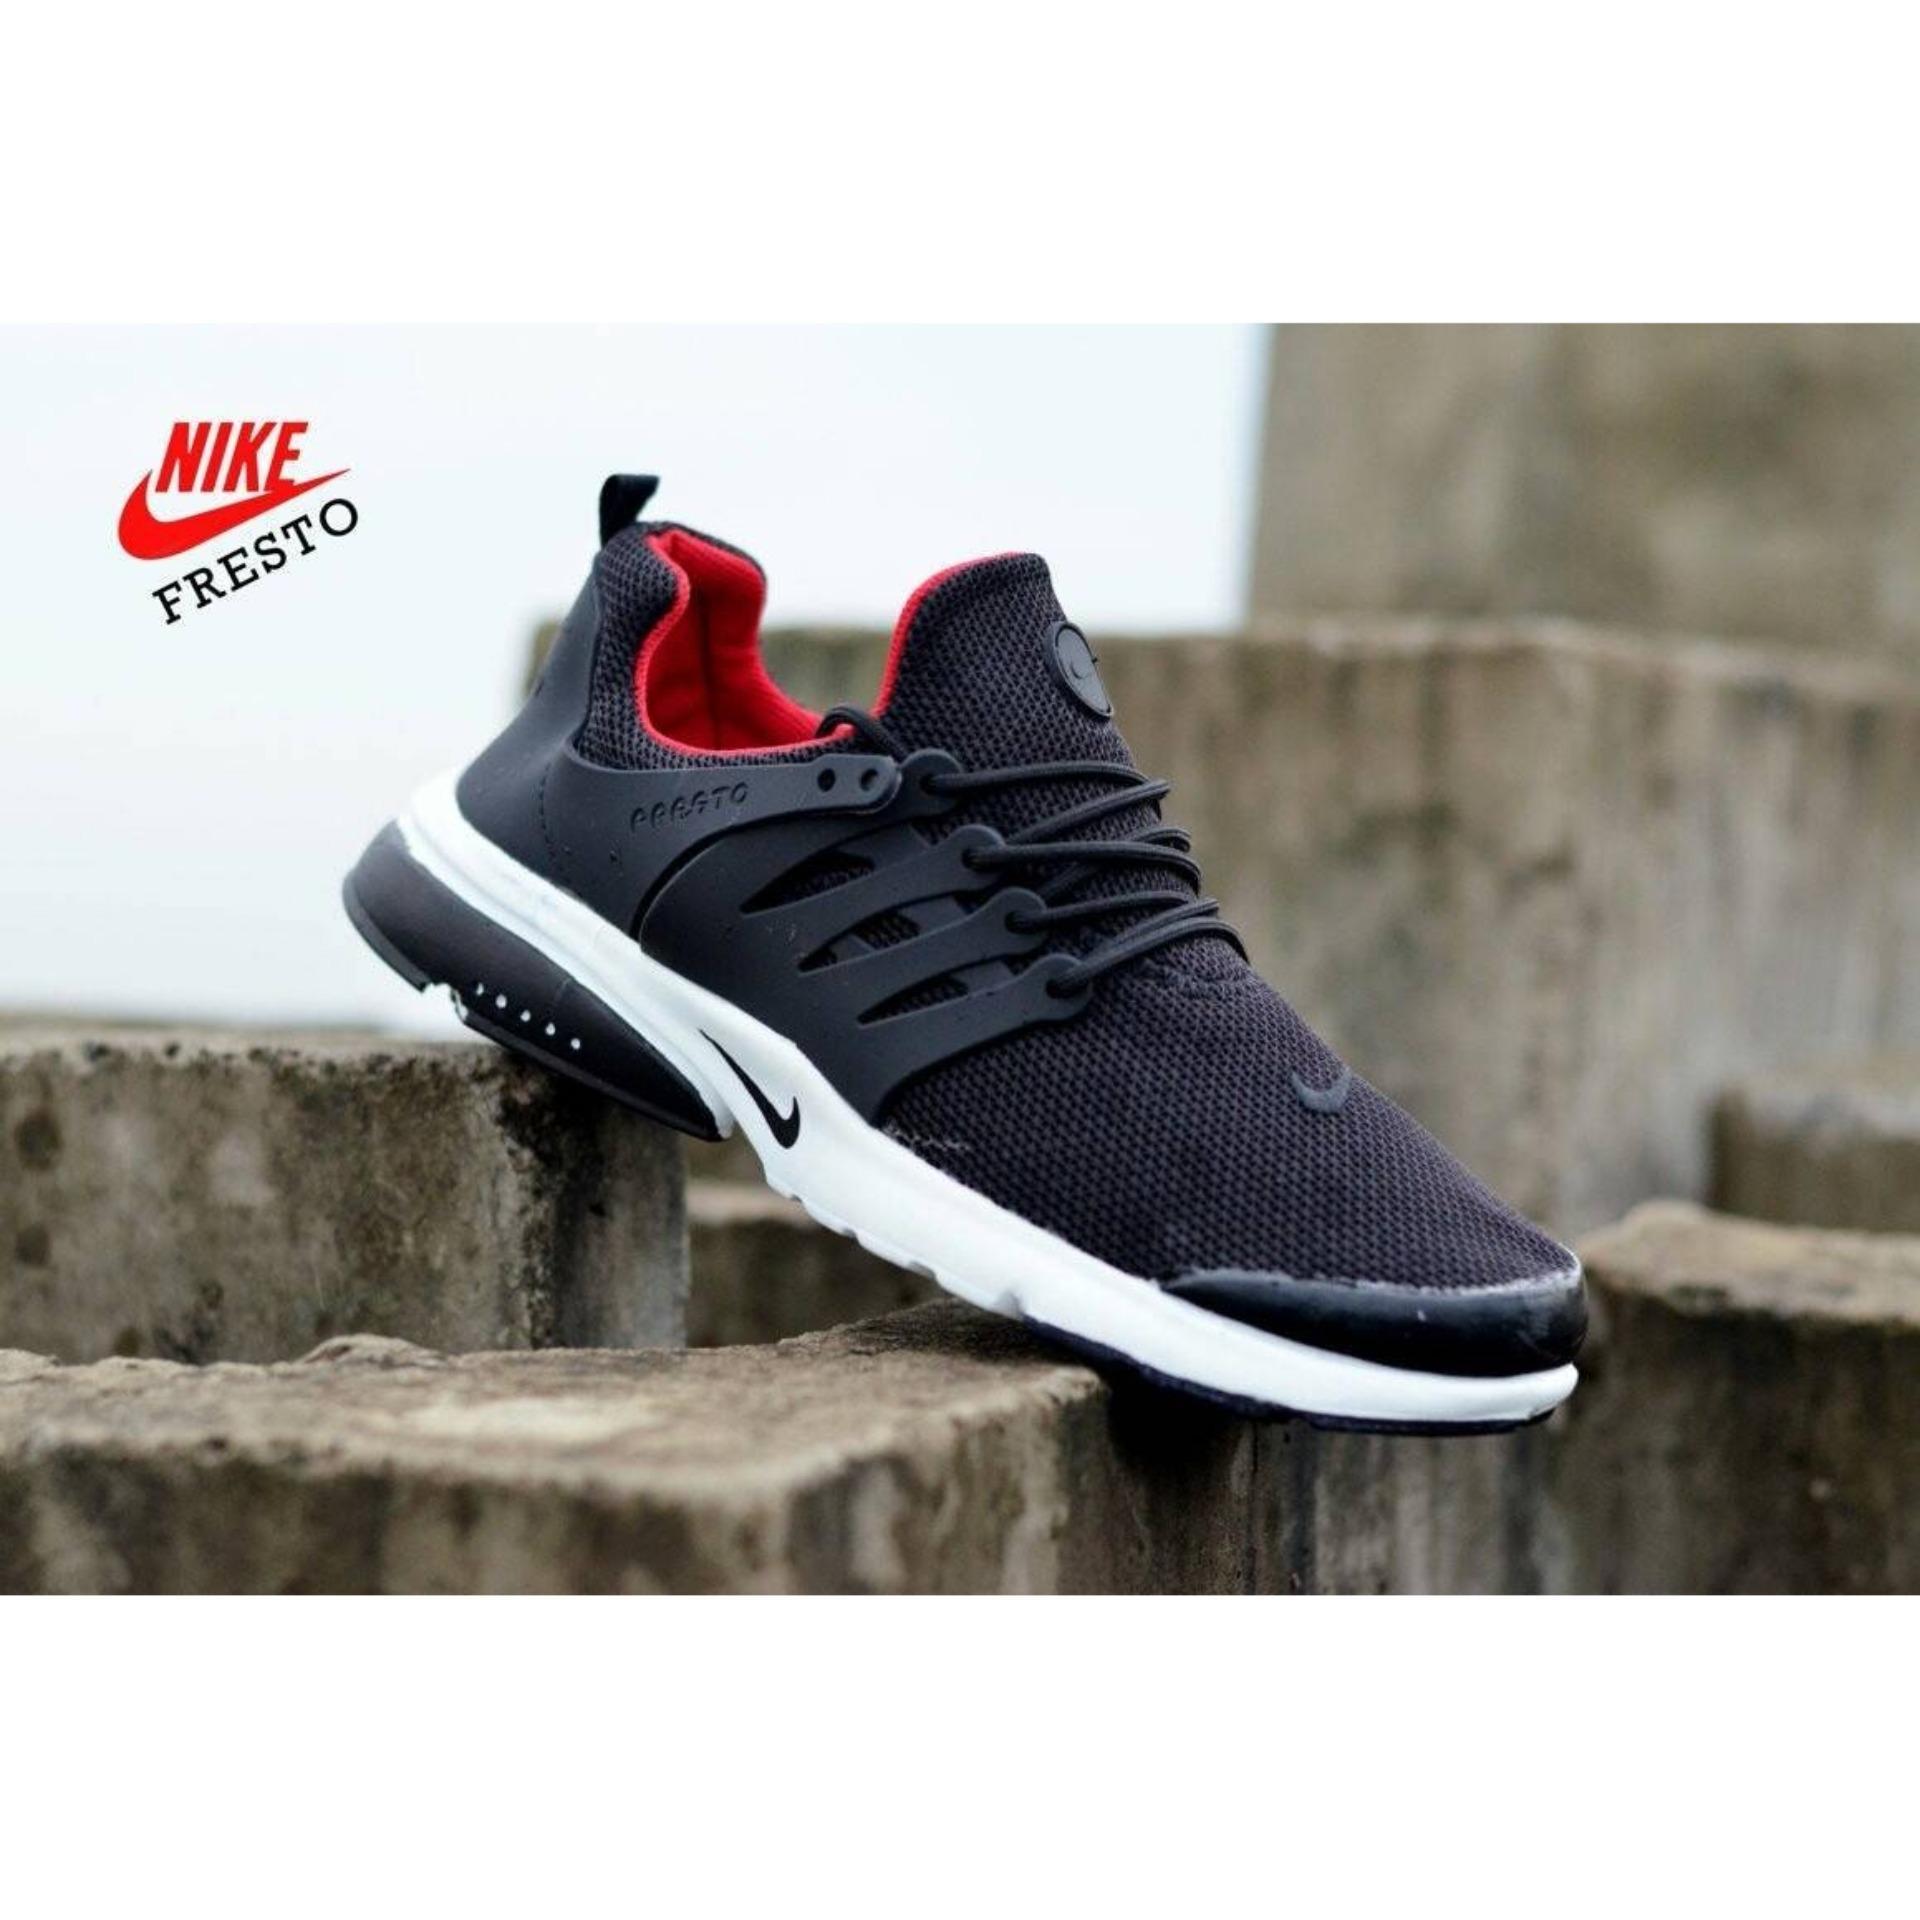 Sepatu Running Nike Presto Black Red